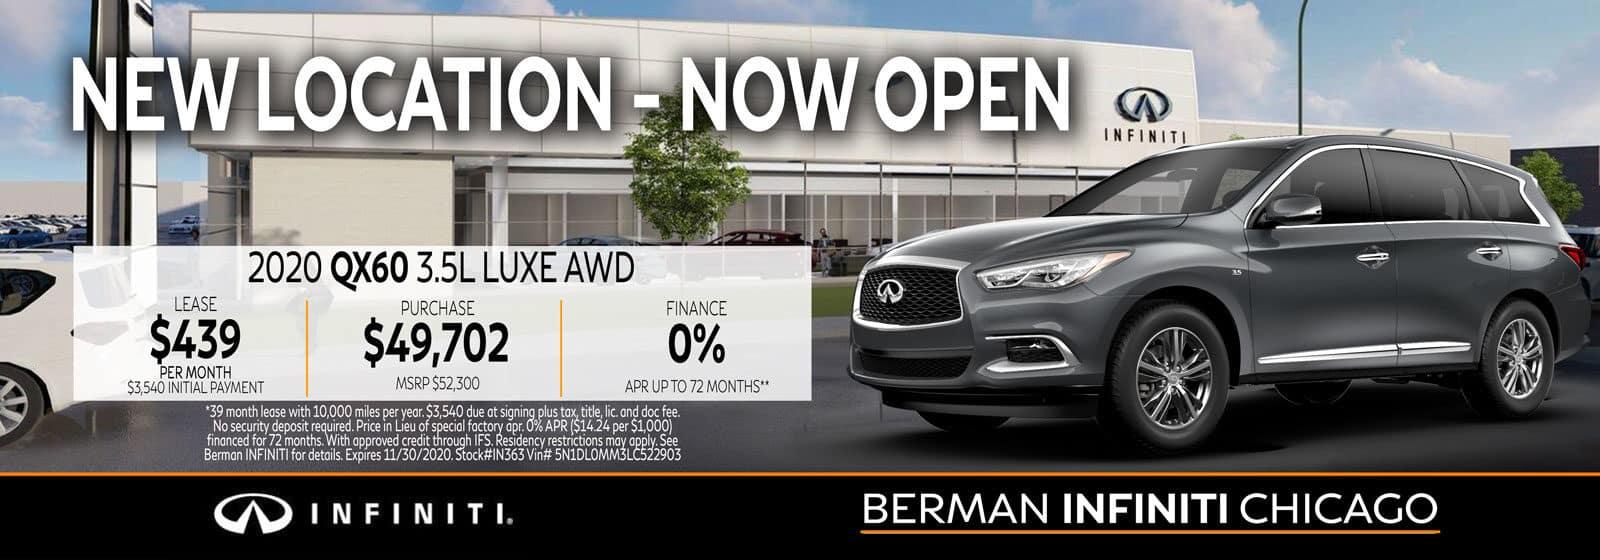 New 2020 INFINITI QX60 November offer at Berman INFINITI Chicago!